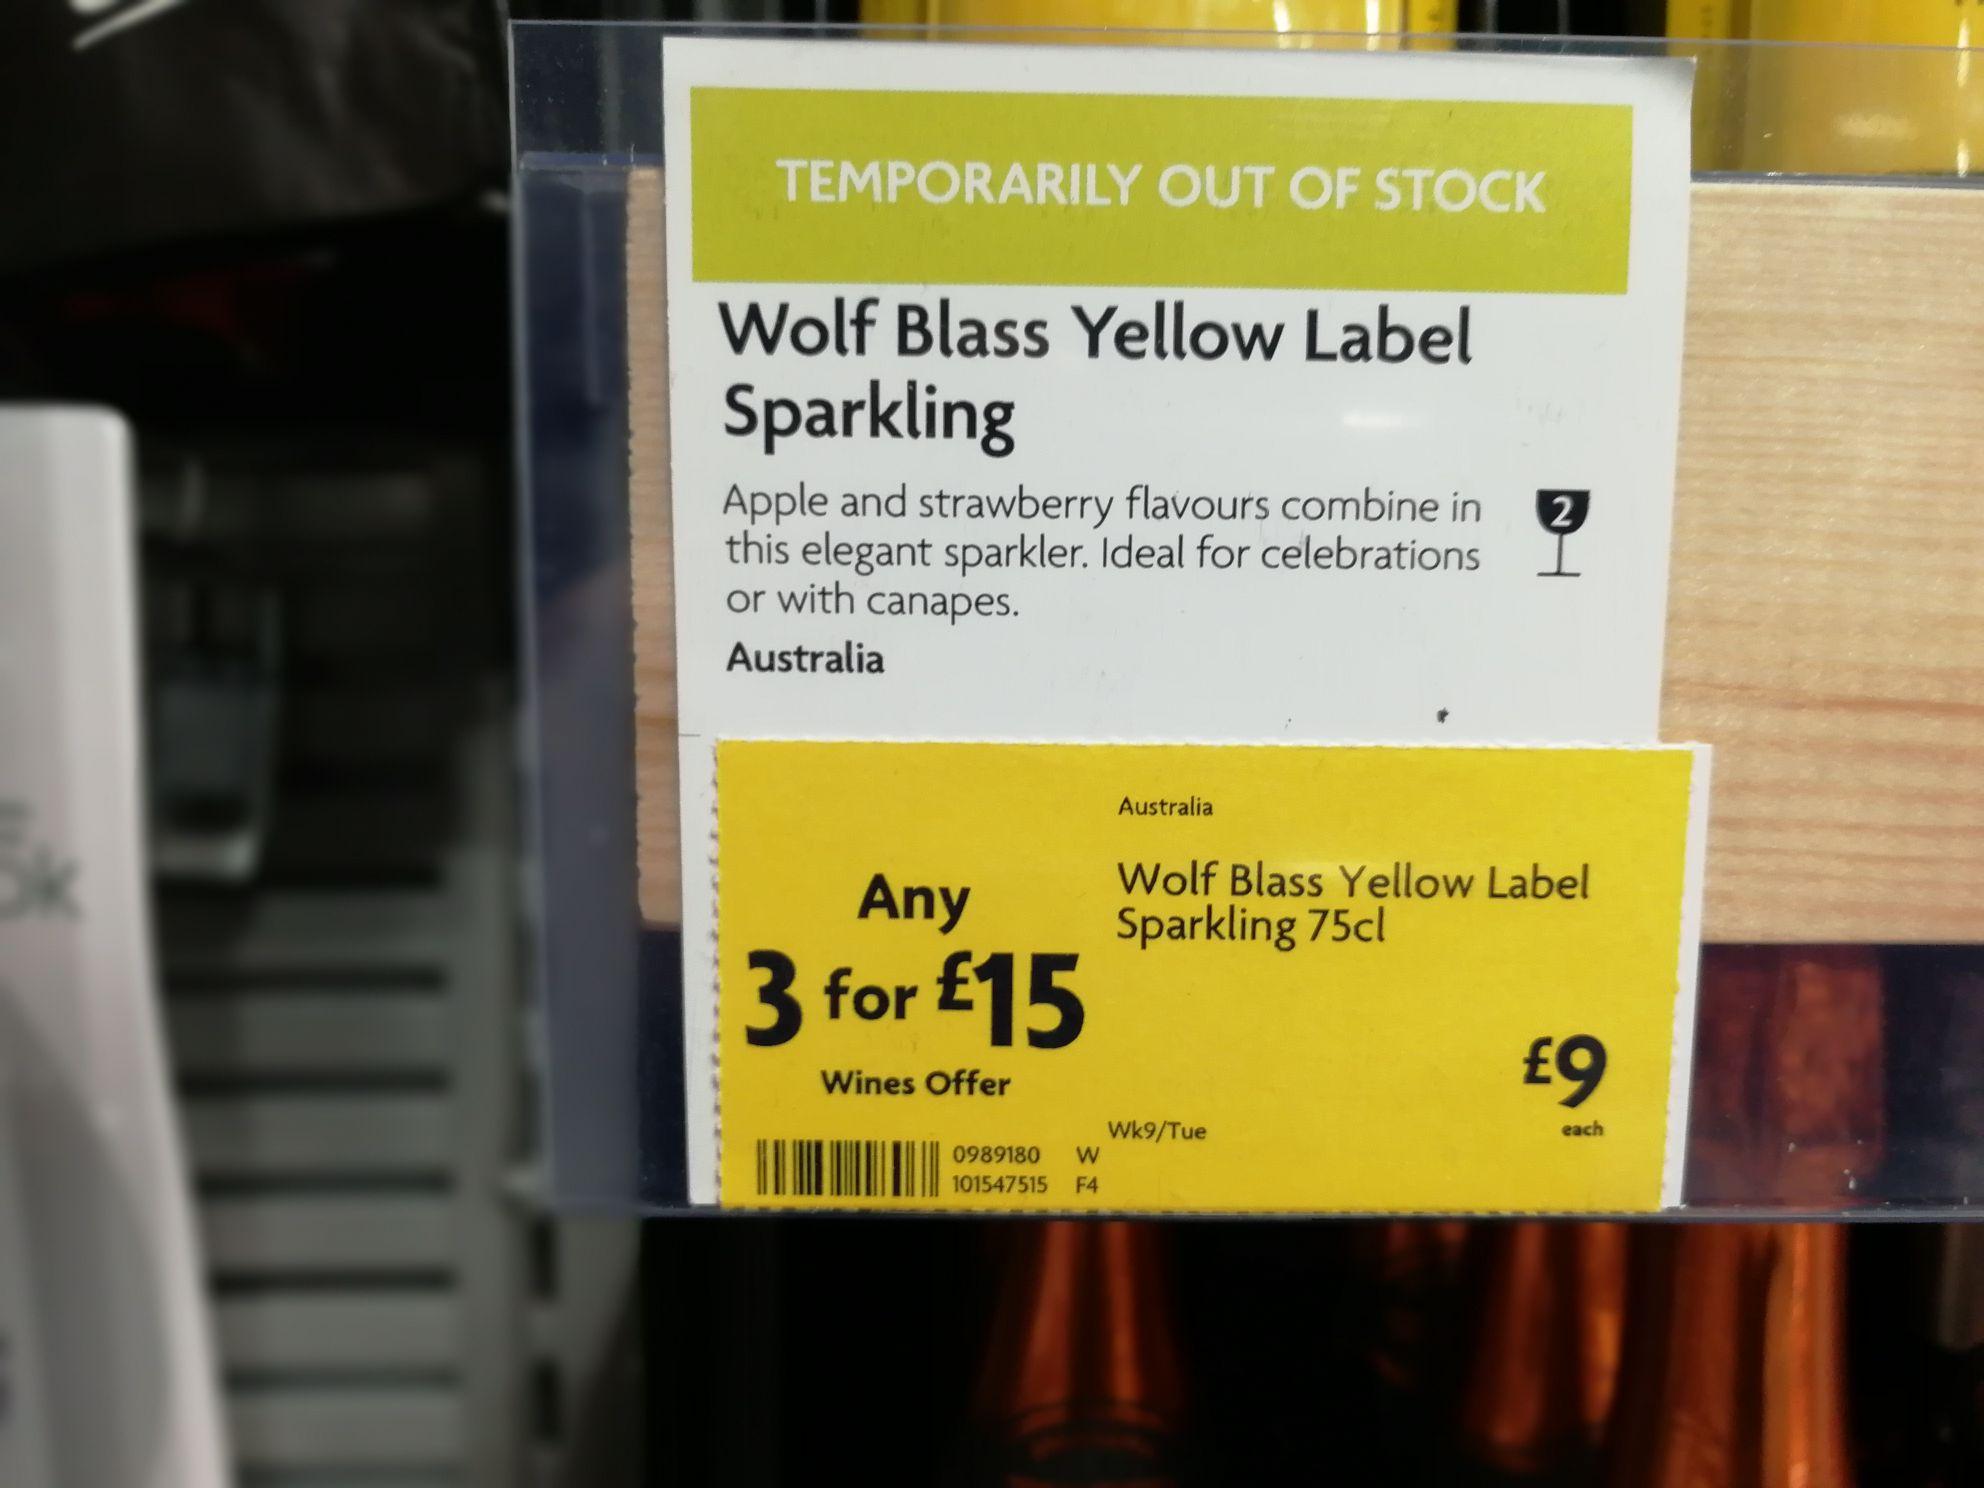 Wolf Blass (was 'Blast' in error) yellow label sparkling wine. 3 for £15.00 @ Morrisons